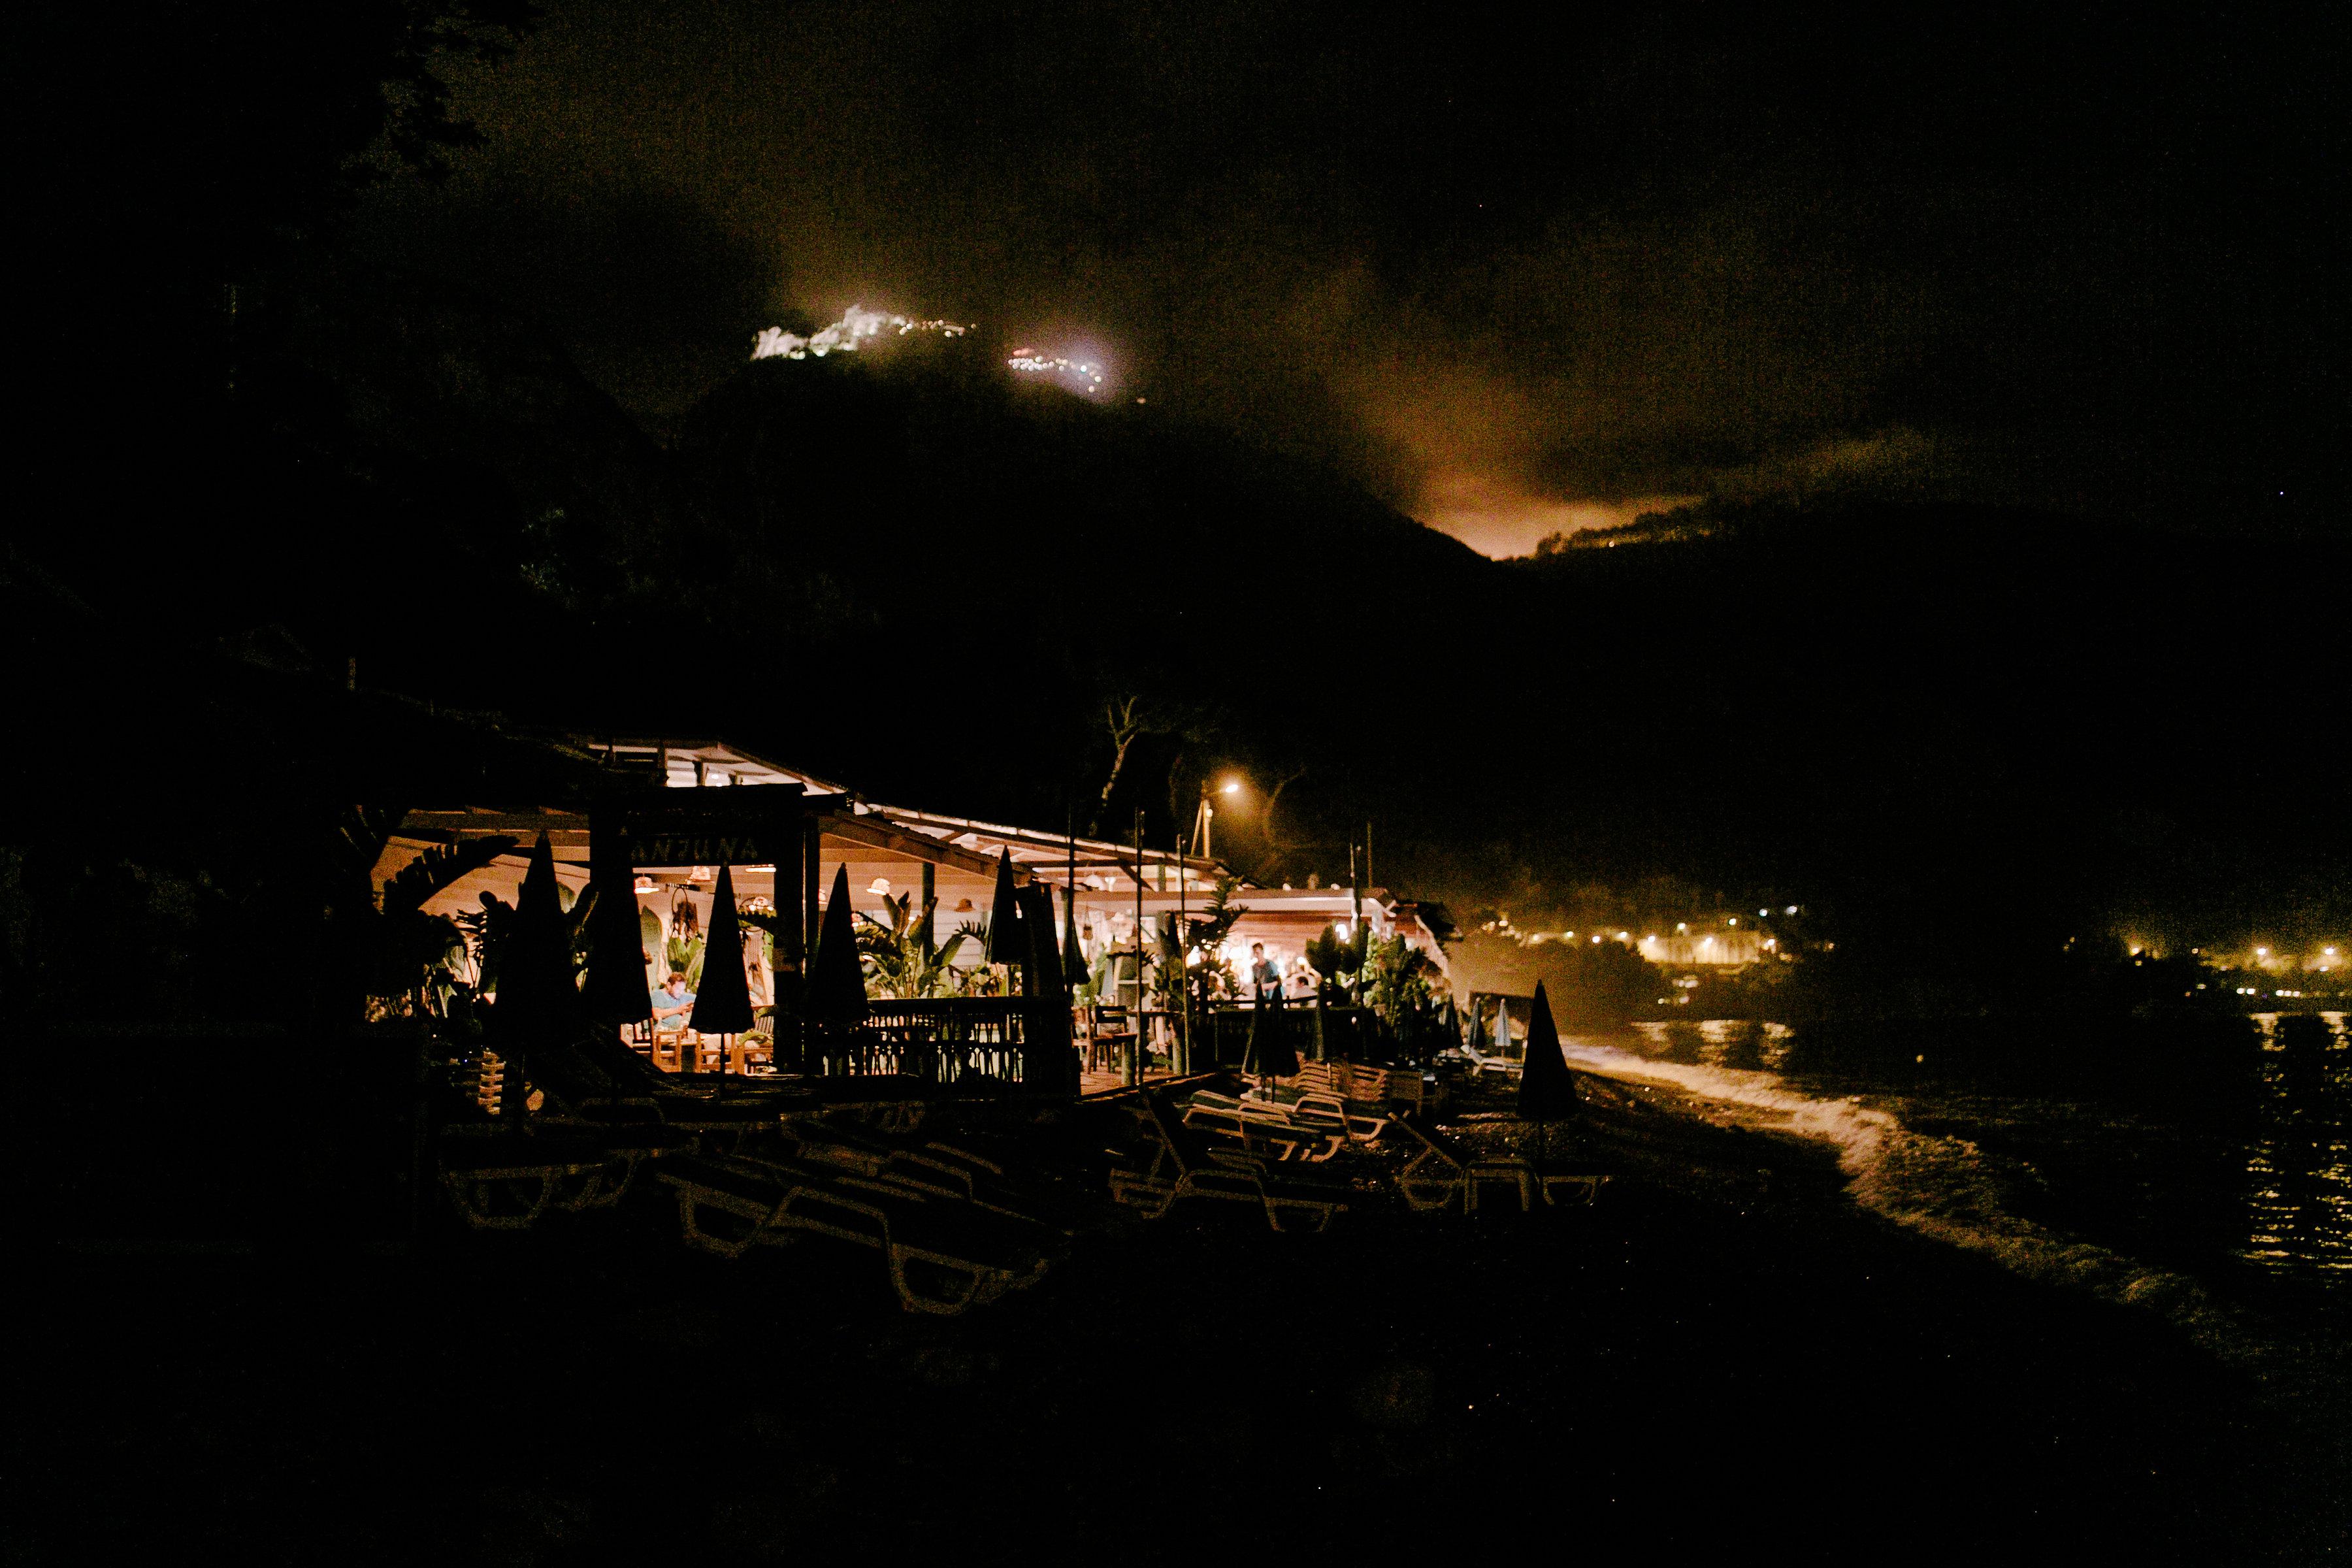 Anjuna, a beach restaurant at night by the Mediterranean Sea.